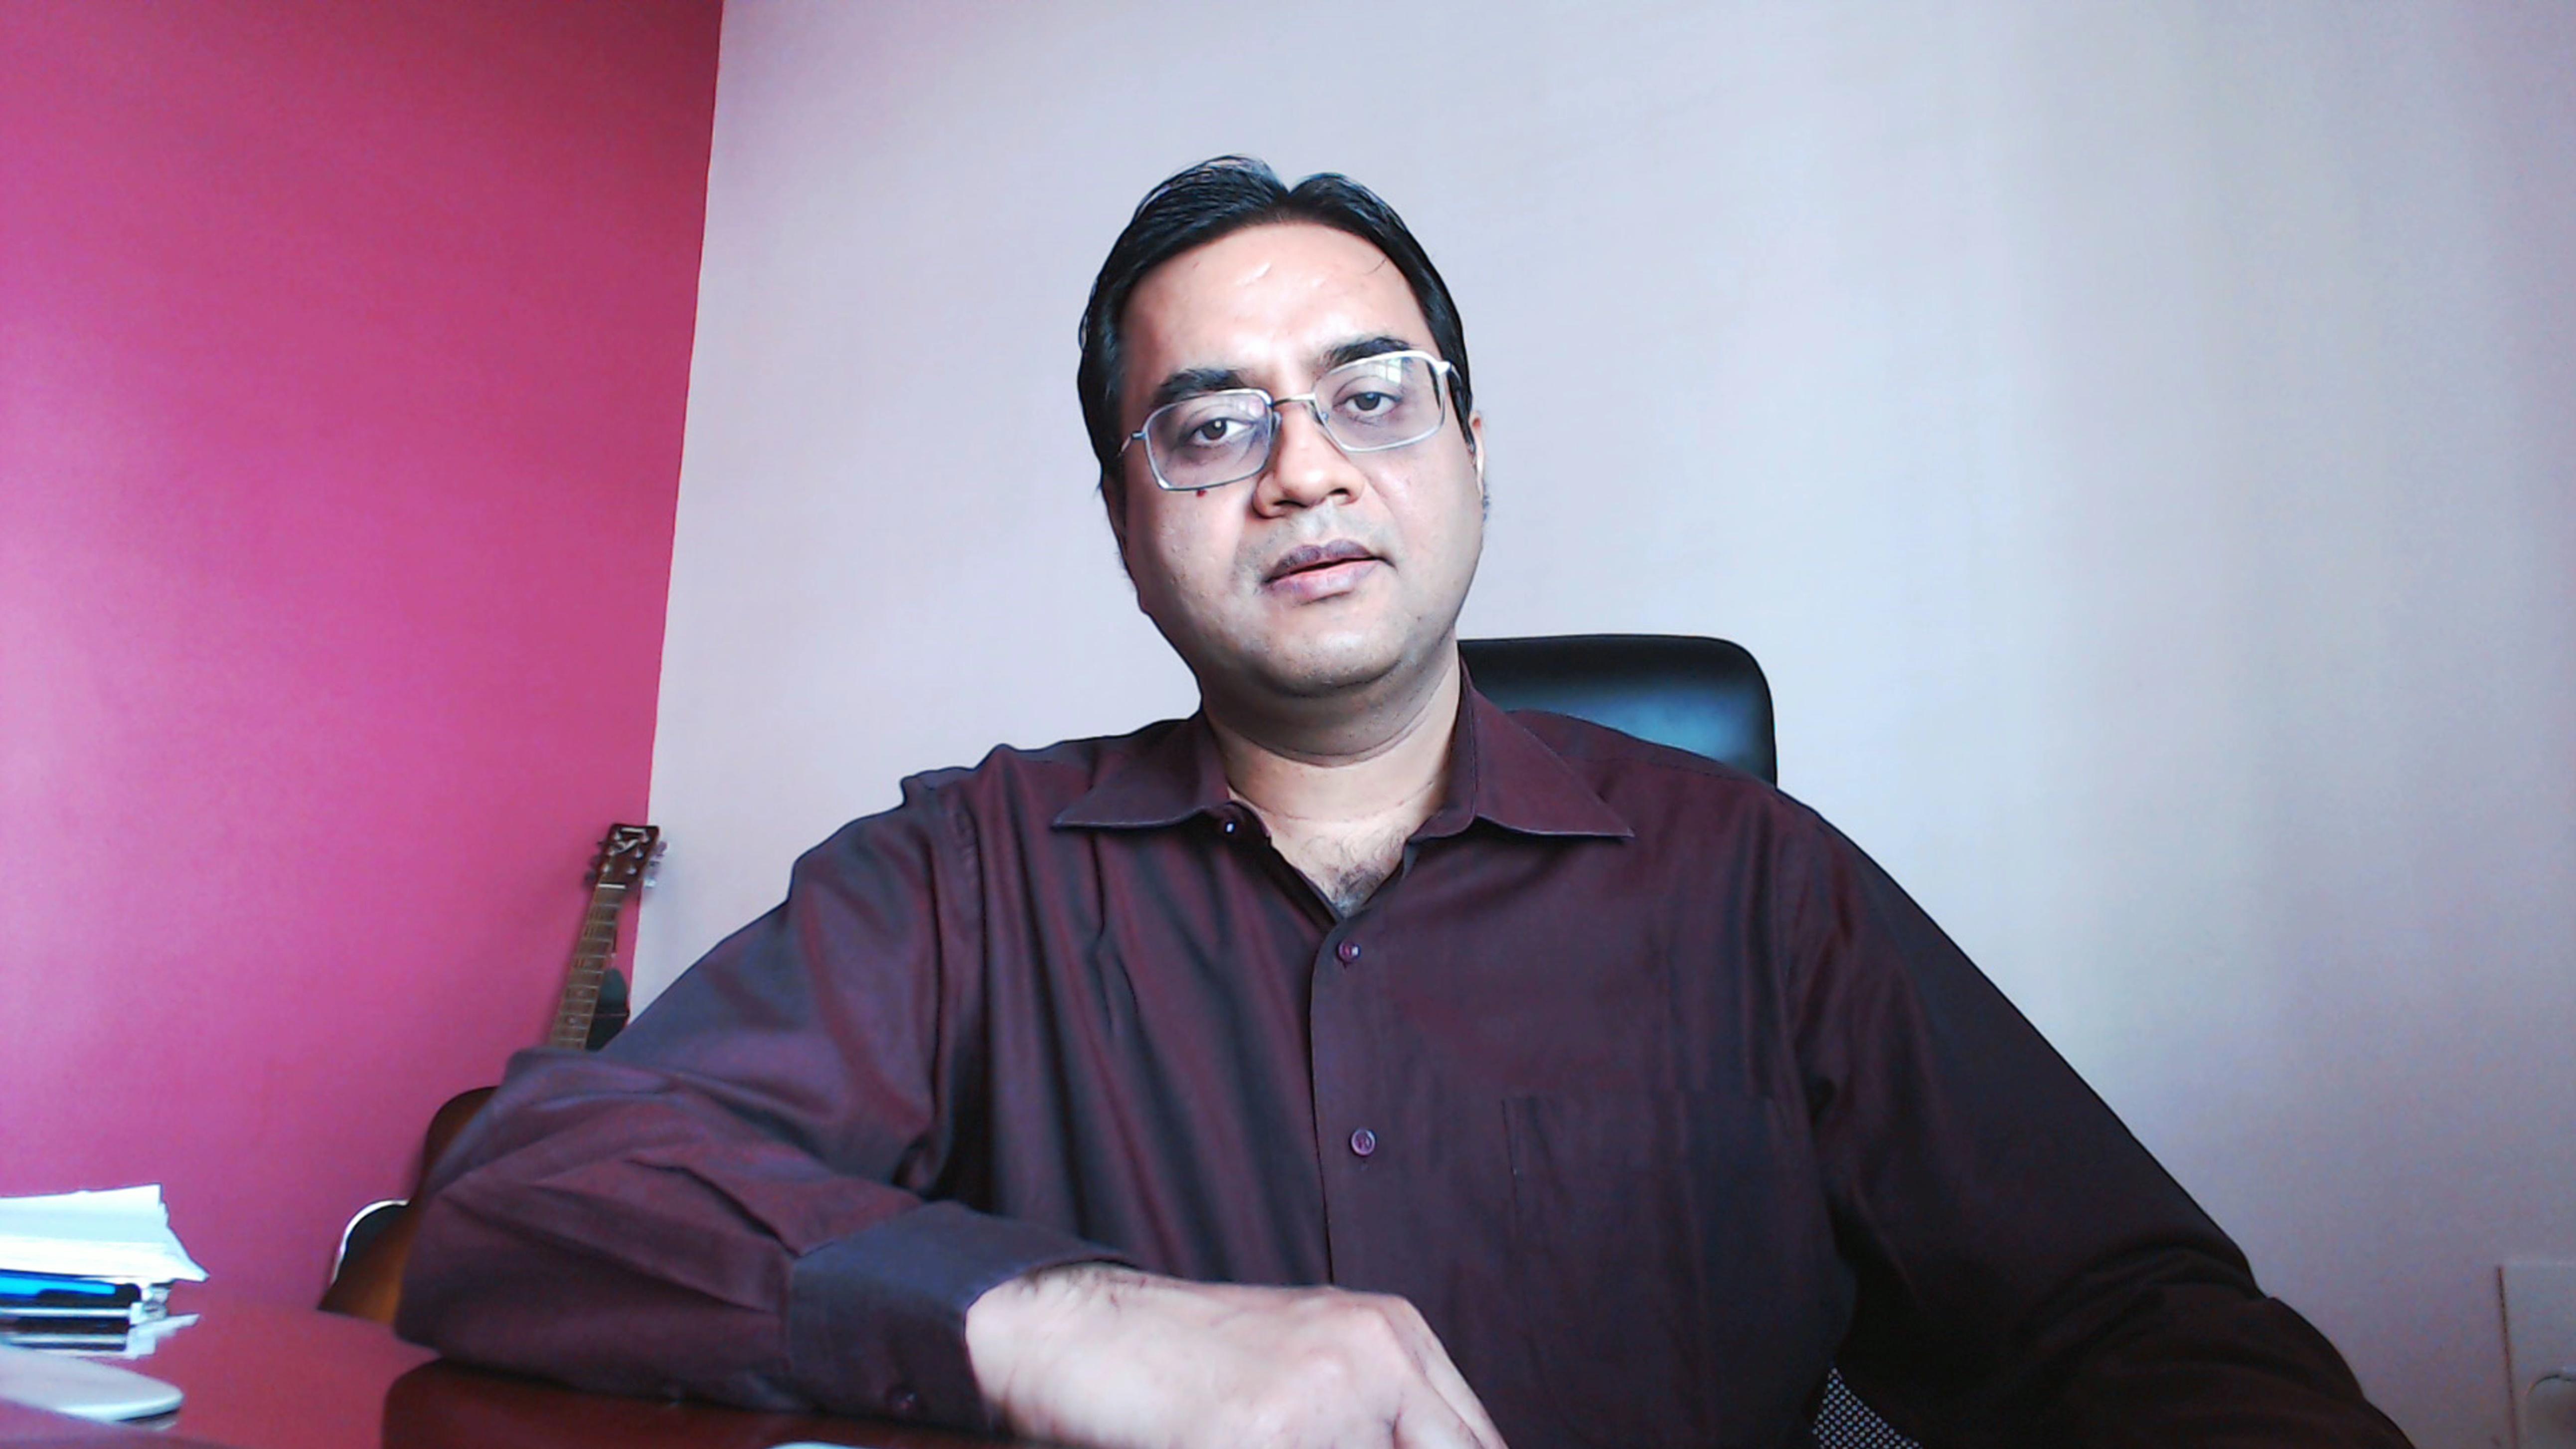 Gita-Vedanta-Guide/Astrologer Manish Verma